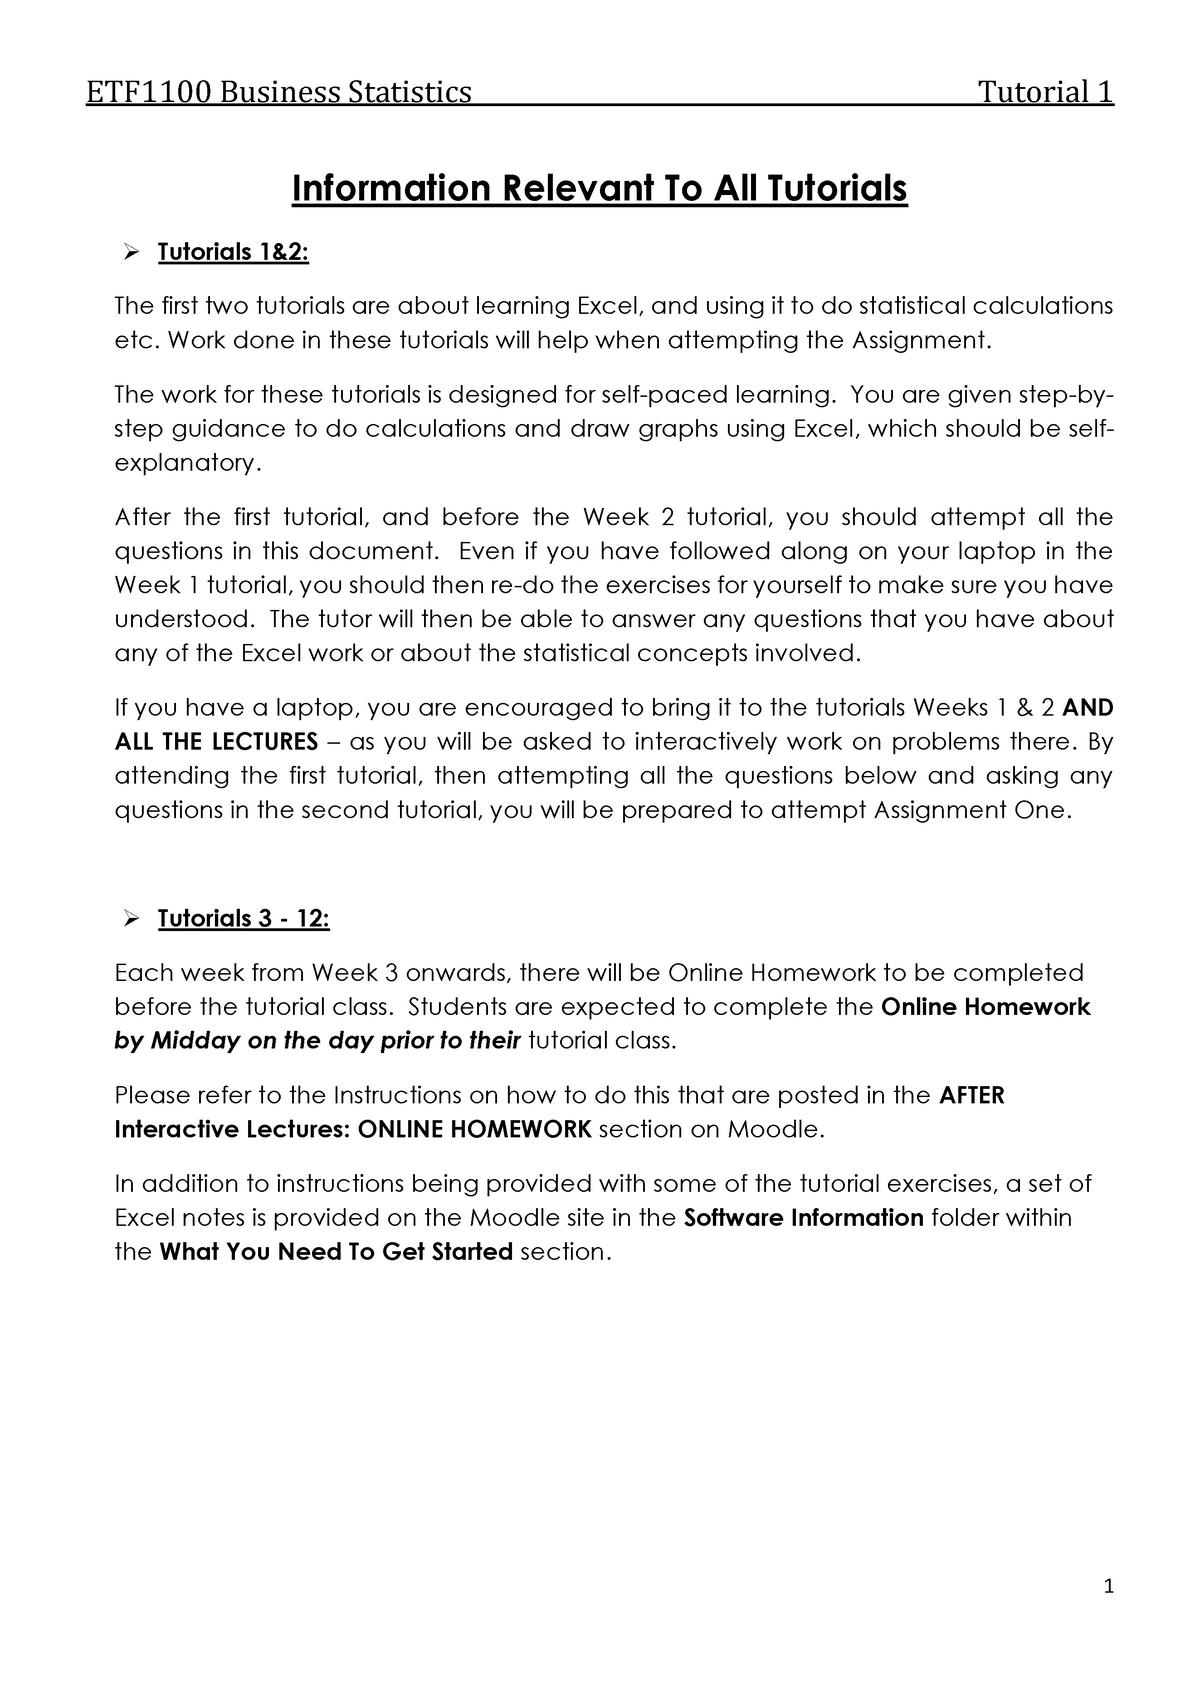 Tutorial 01 Questions - ETF1100: Business Statistics - StuDocu